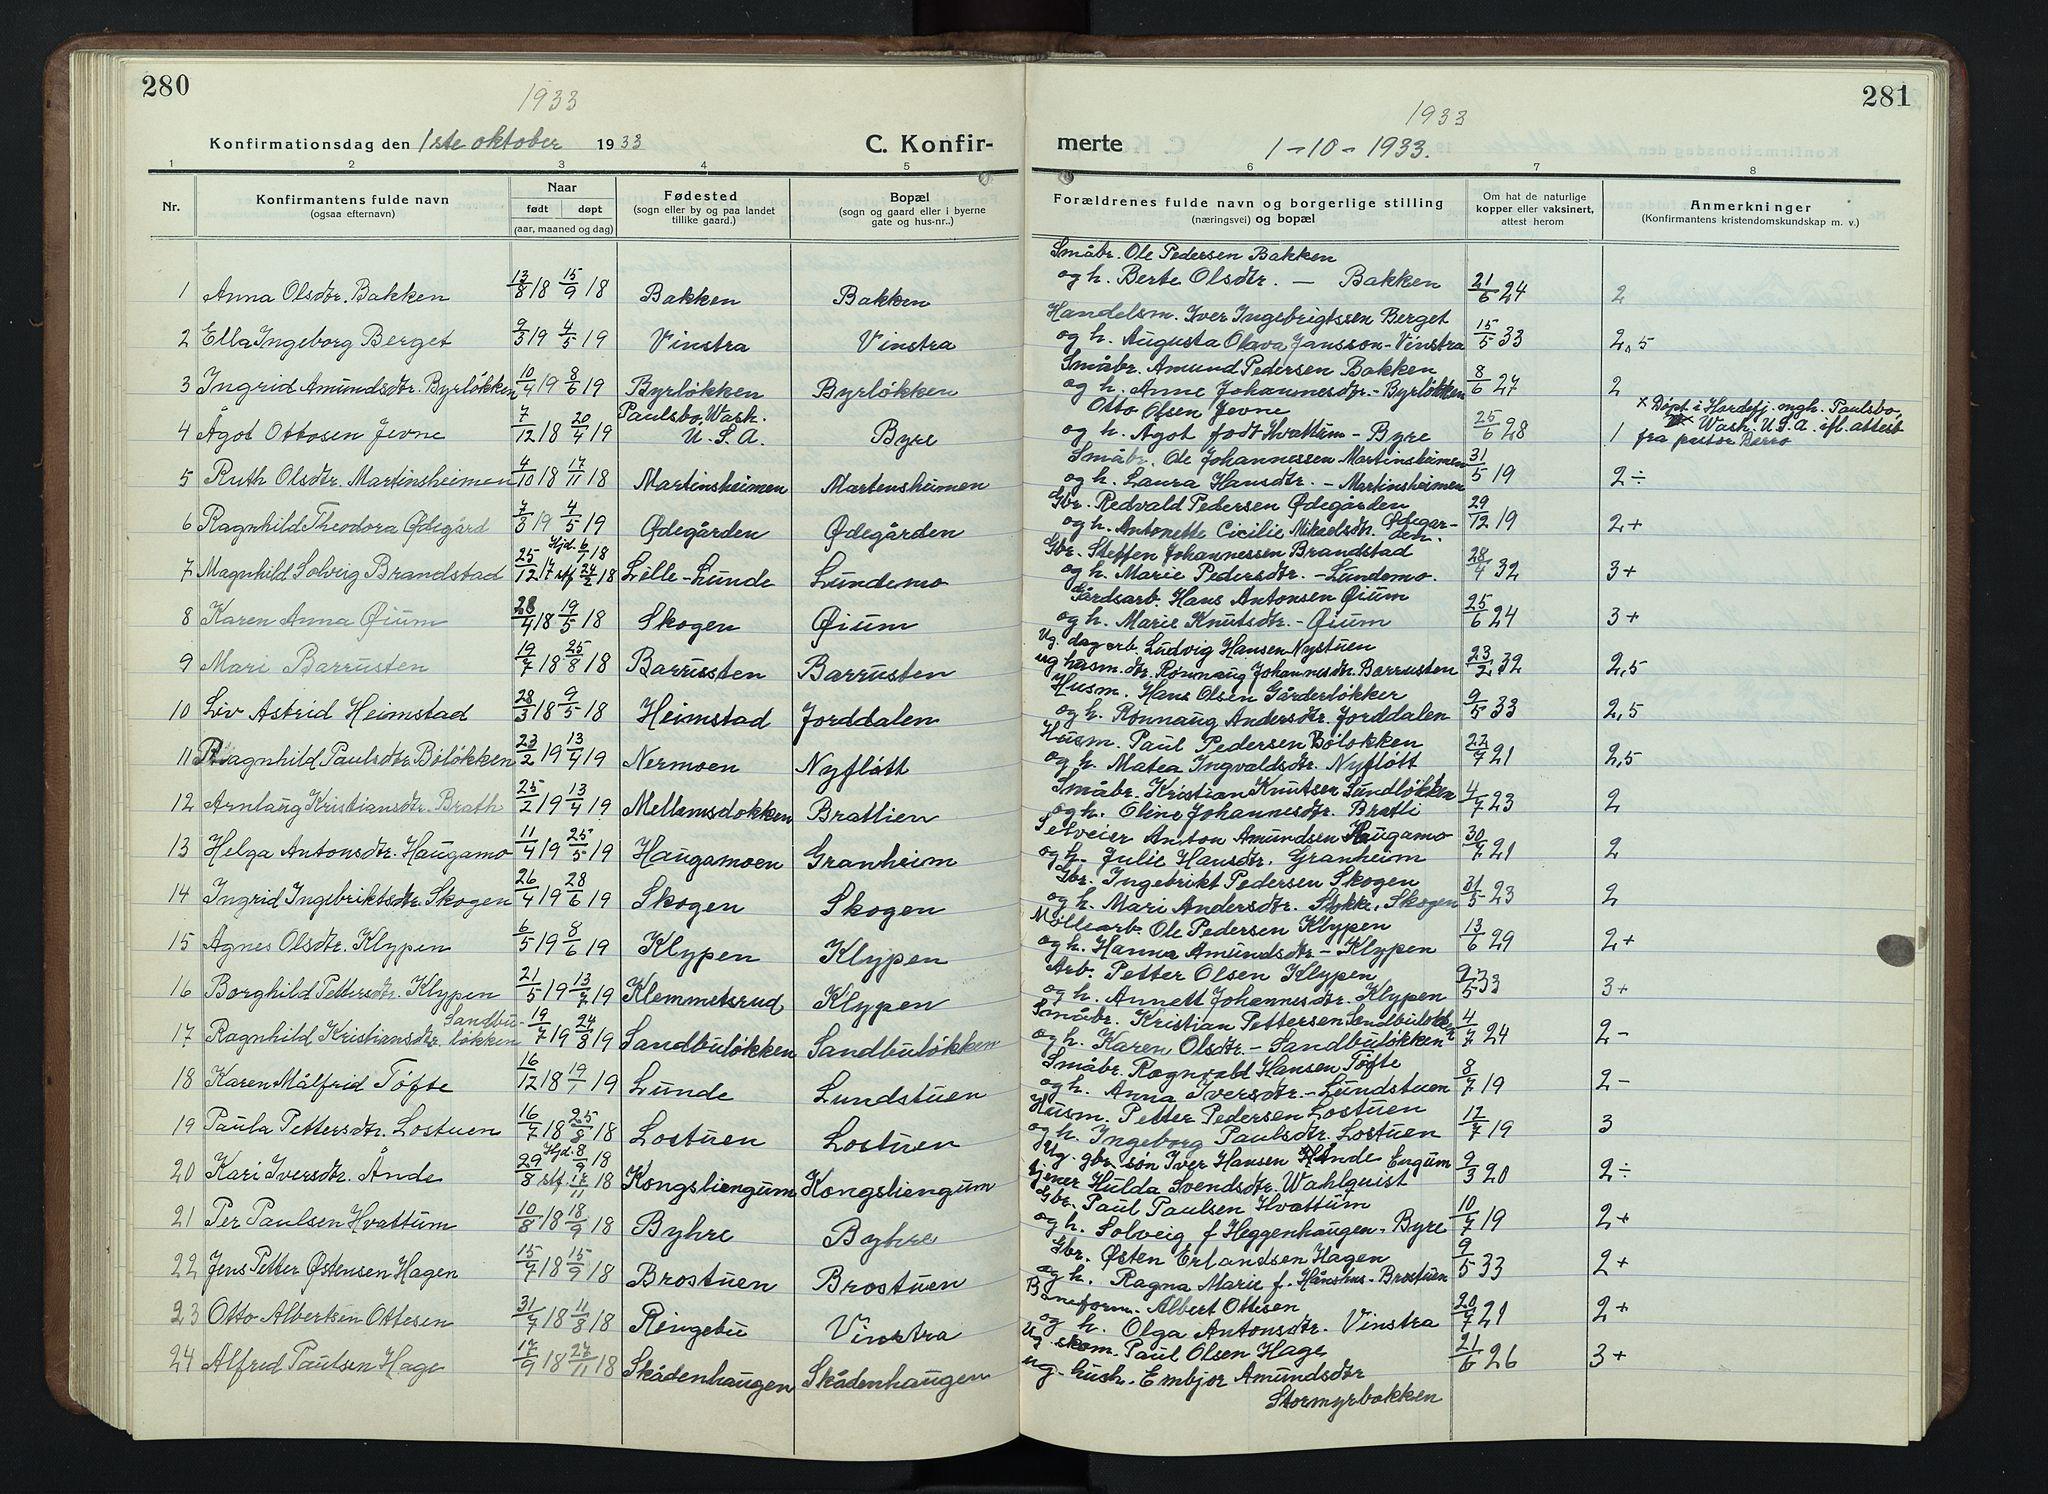 SAH, Nord-Fron prestekontor, Klokkerbok nr. 7, 1915-1946, s. 280-281